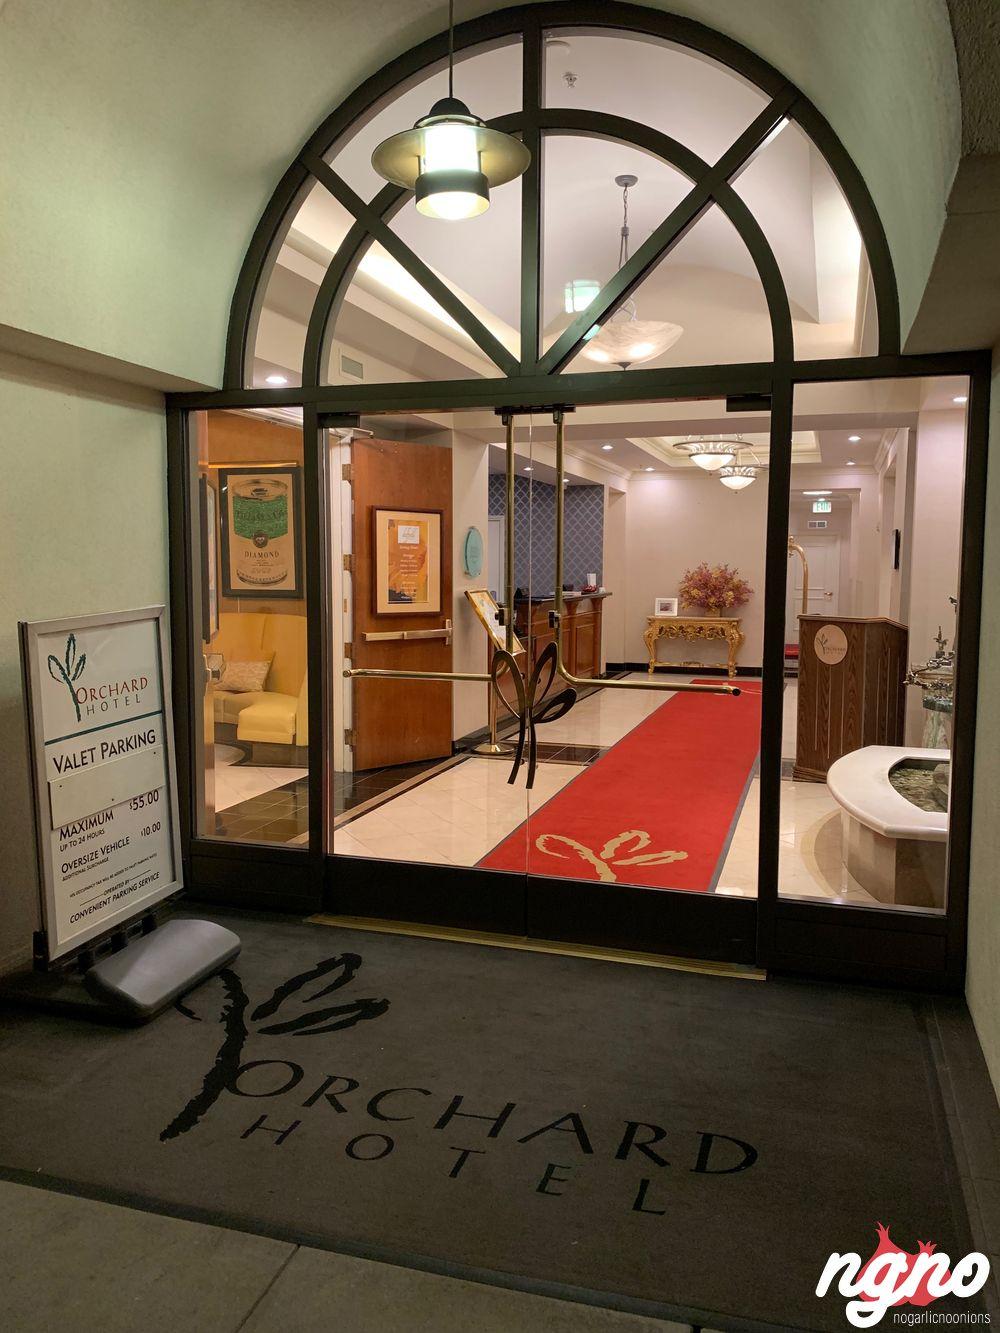 the-orchard-hotel-san-francisco-nogarlicnoonions-482018-10-24-03-36-05